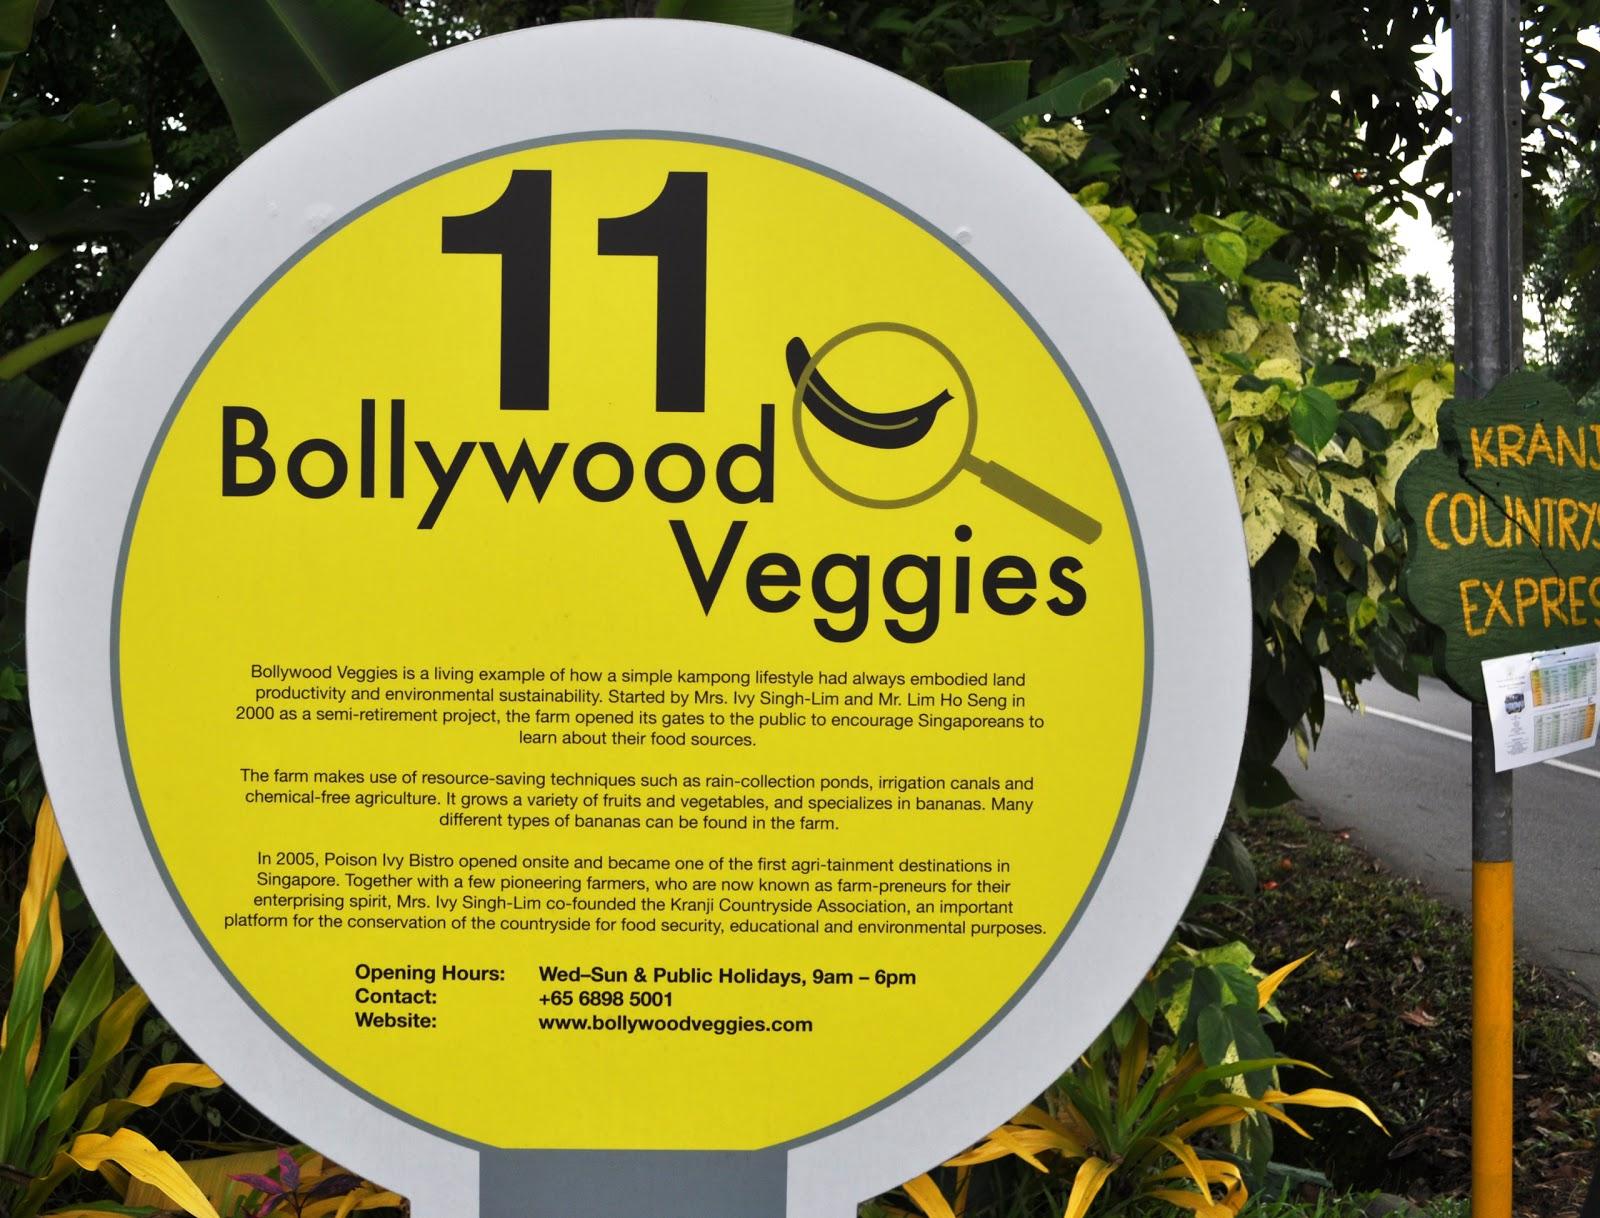 Entree Kibbles: Bollywood Veggies @ Kranji Countryside